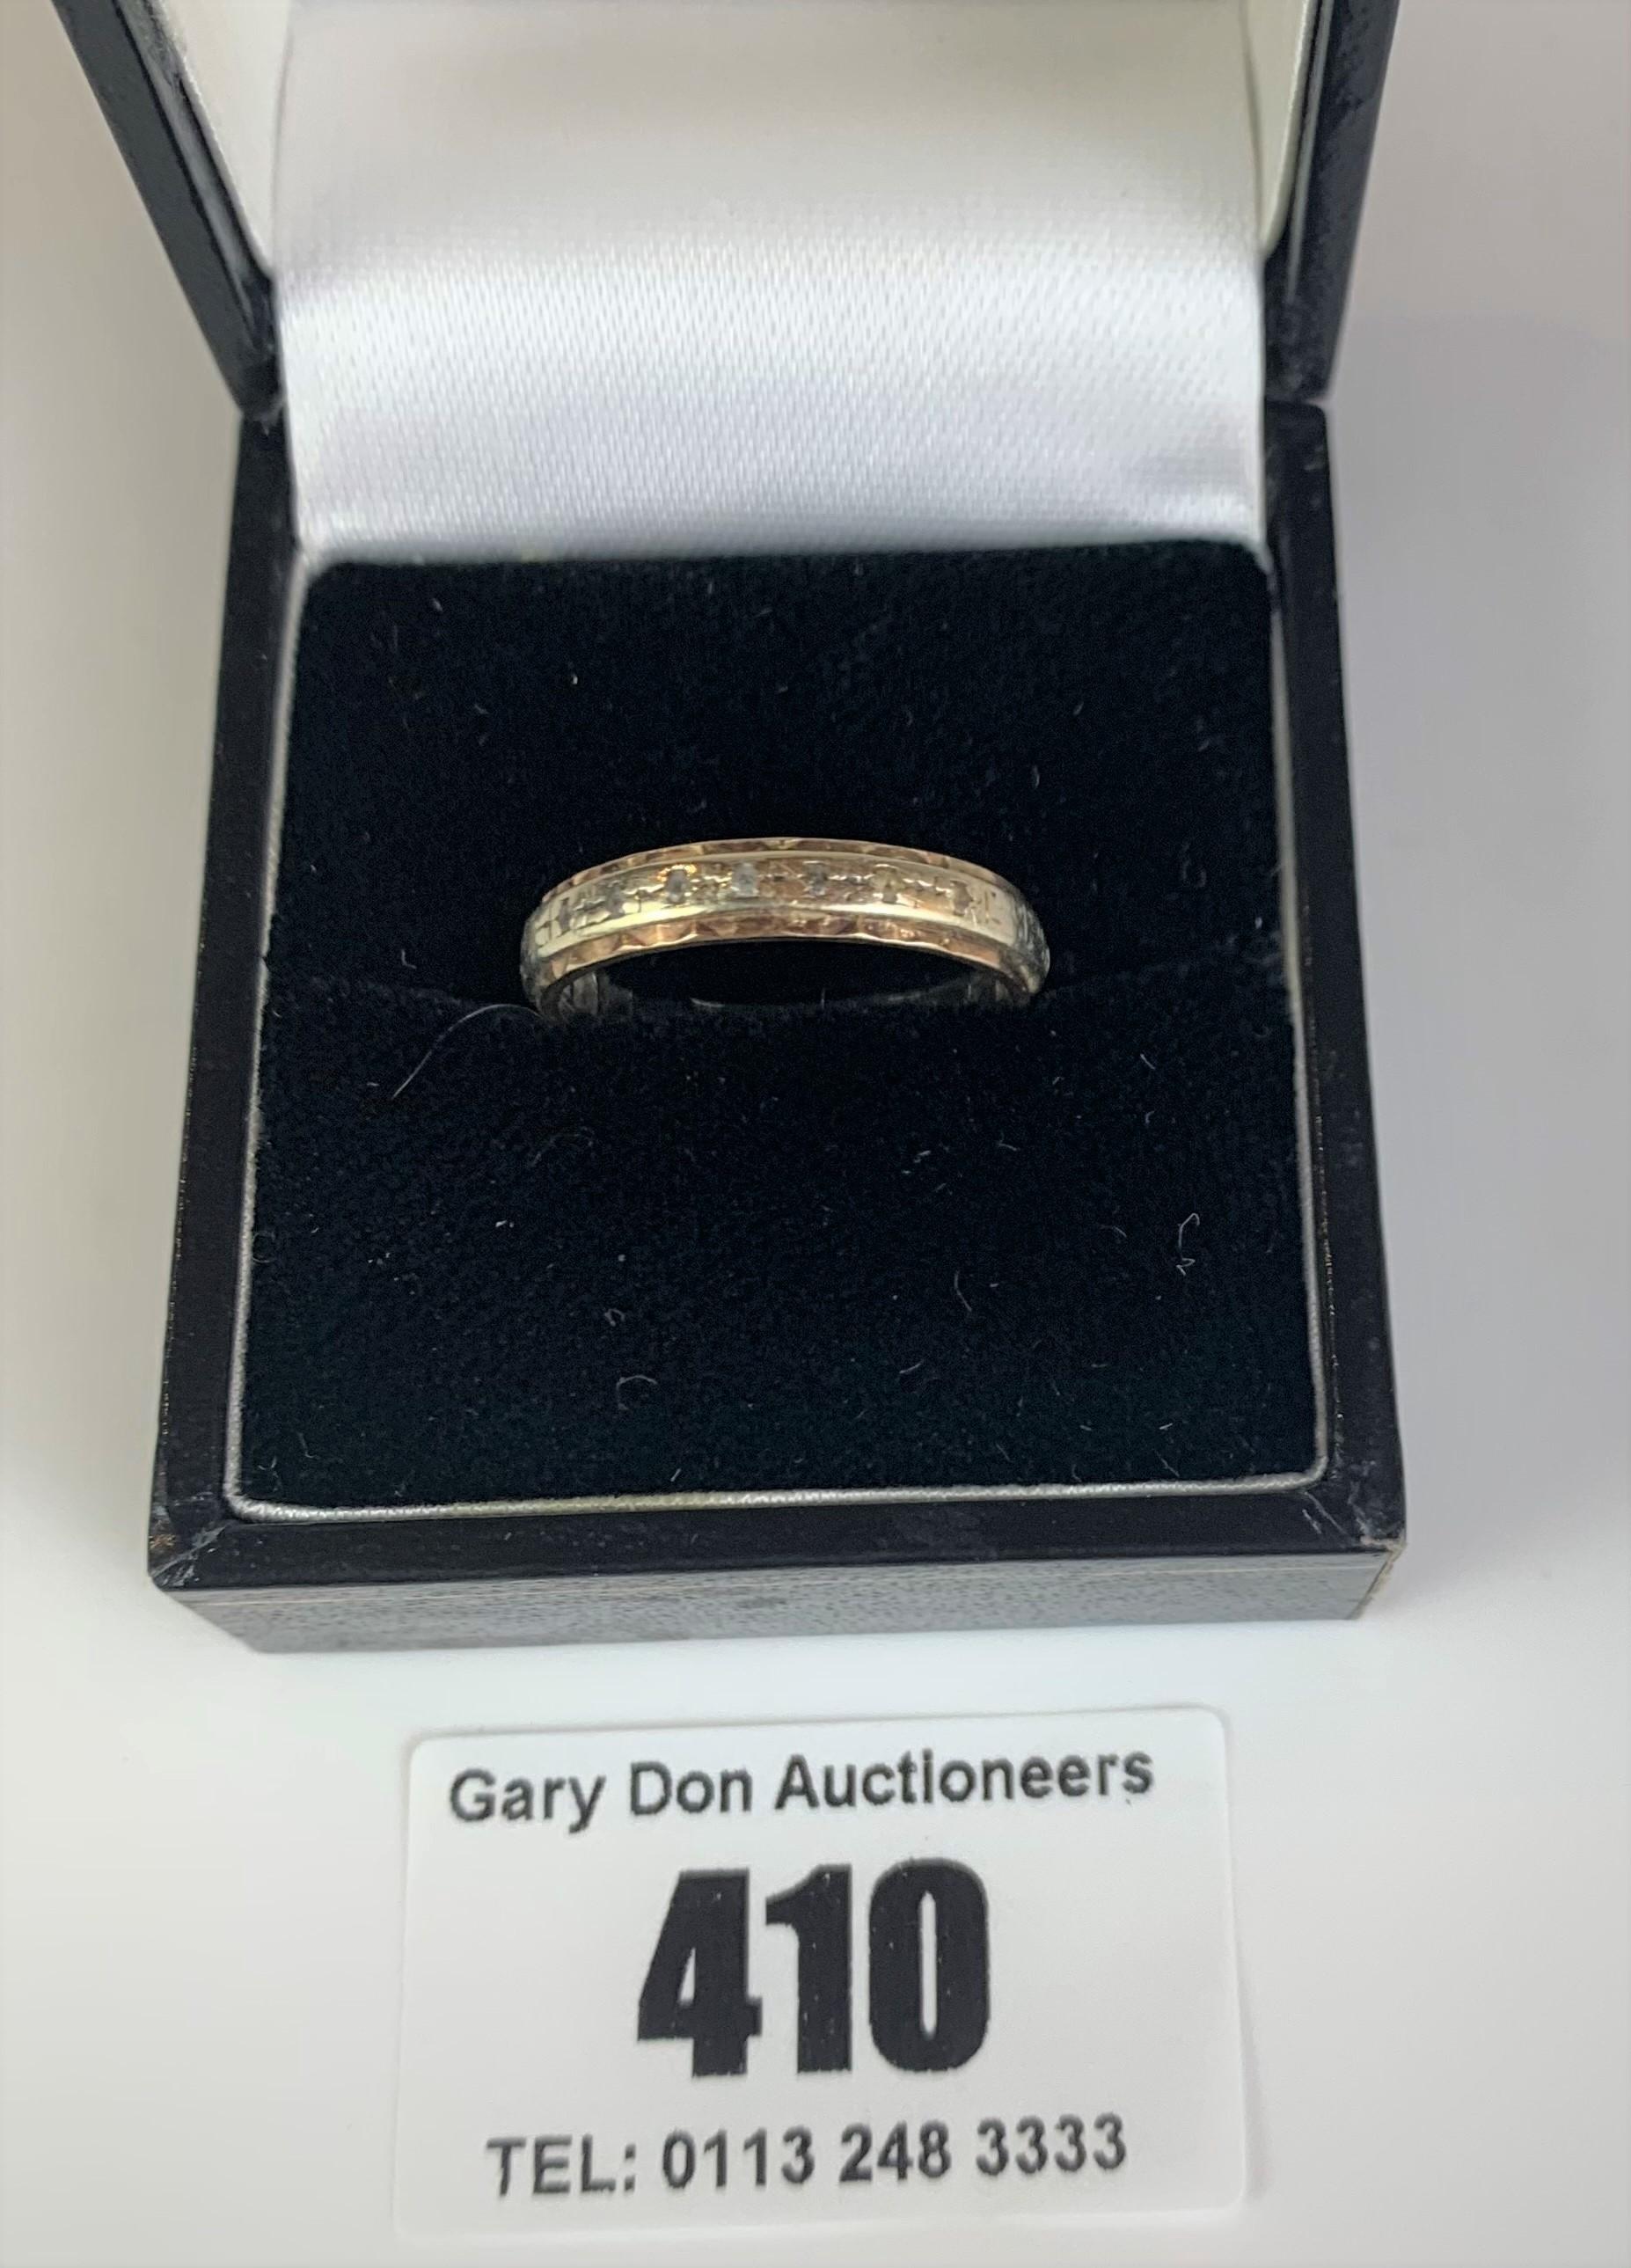 9k gold engraved ring, size N, w: 2.3 gms - Image 3 of 6